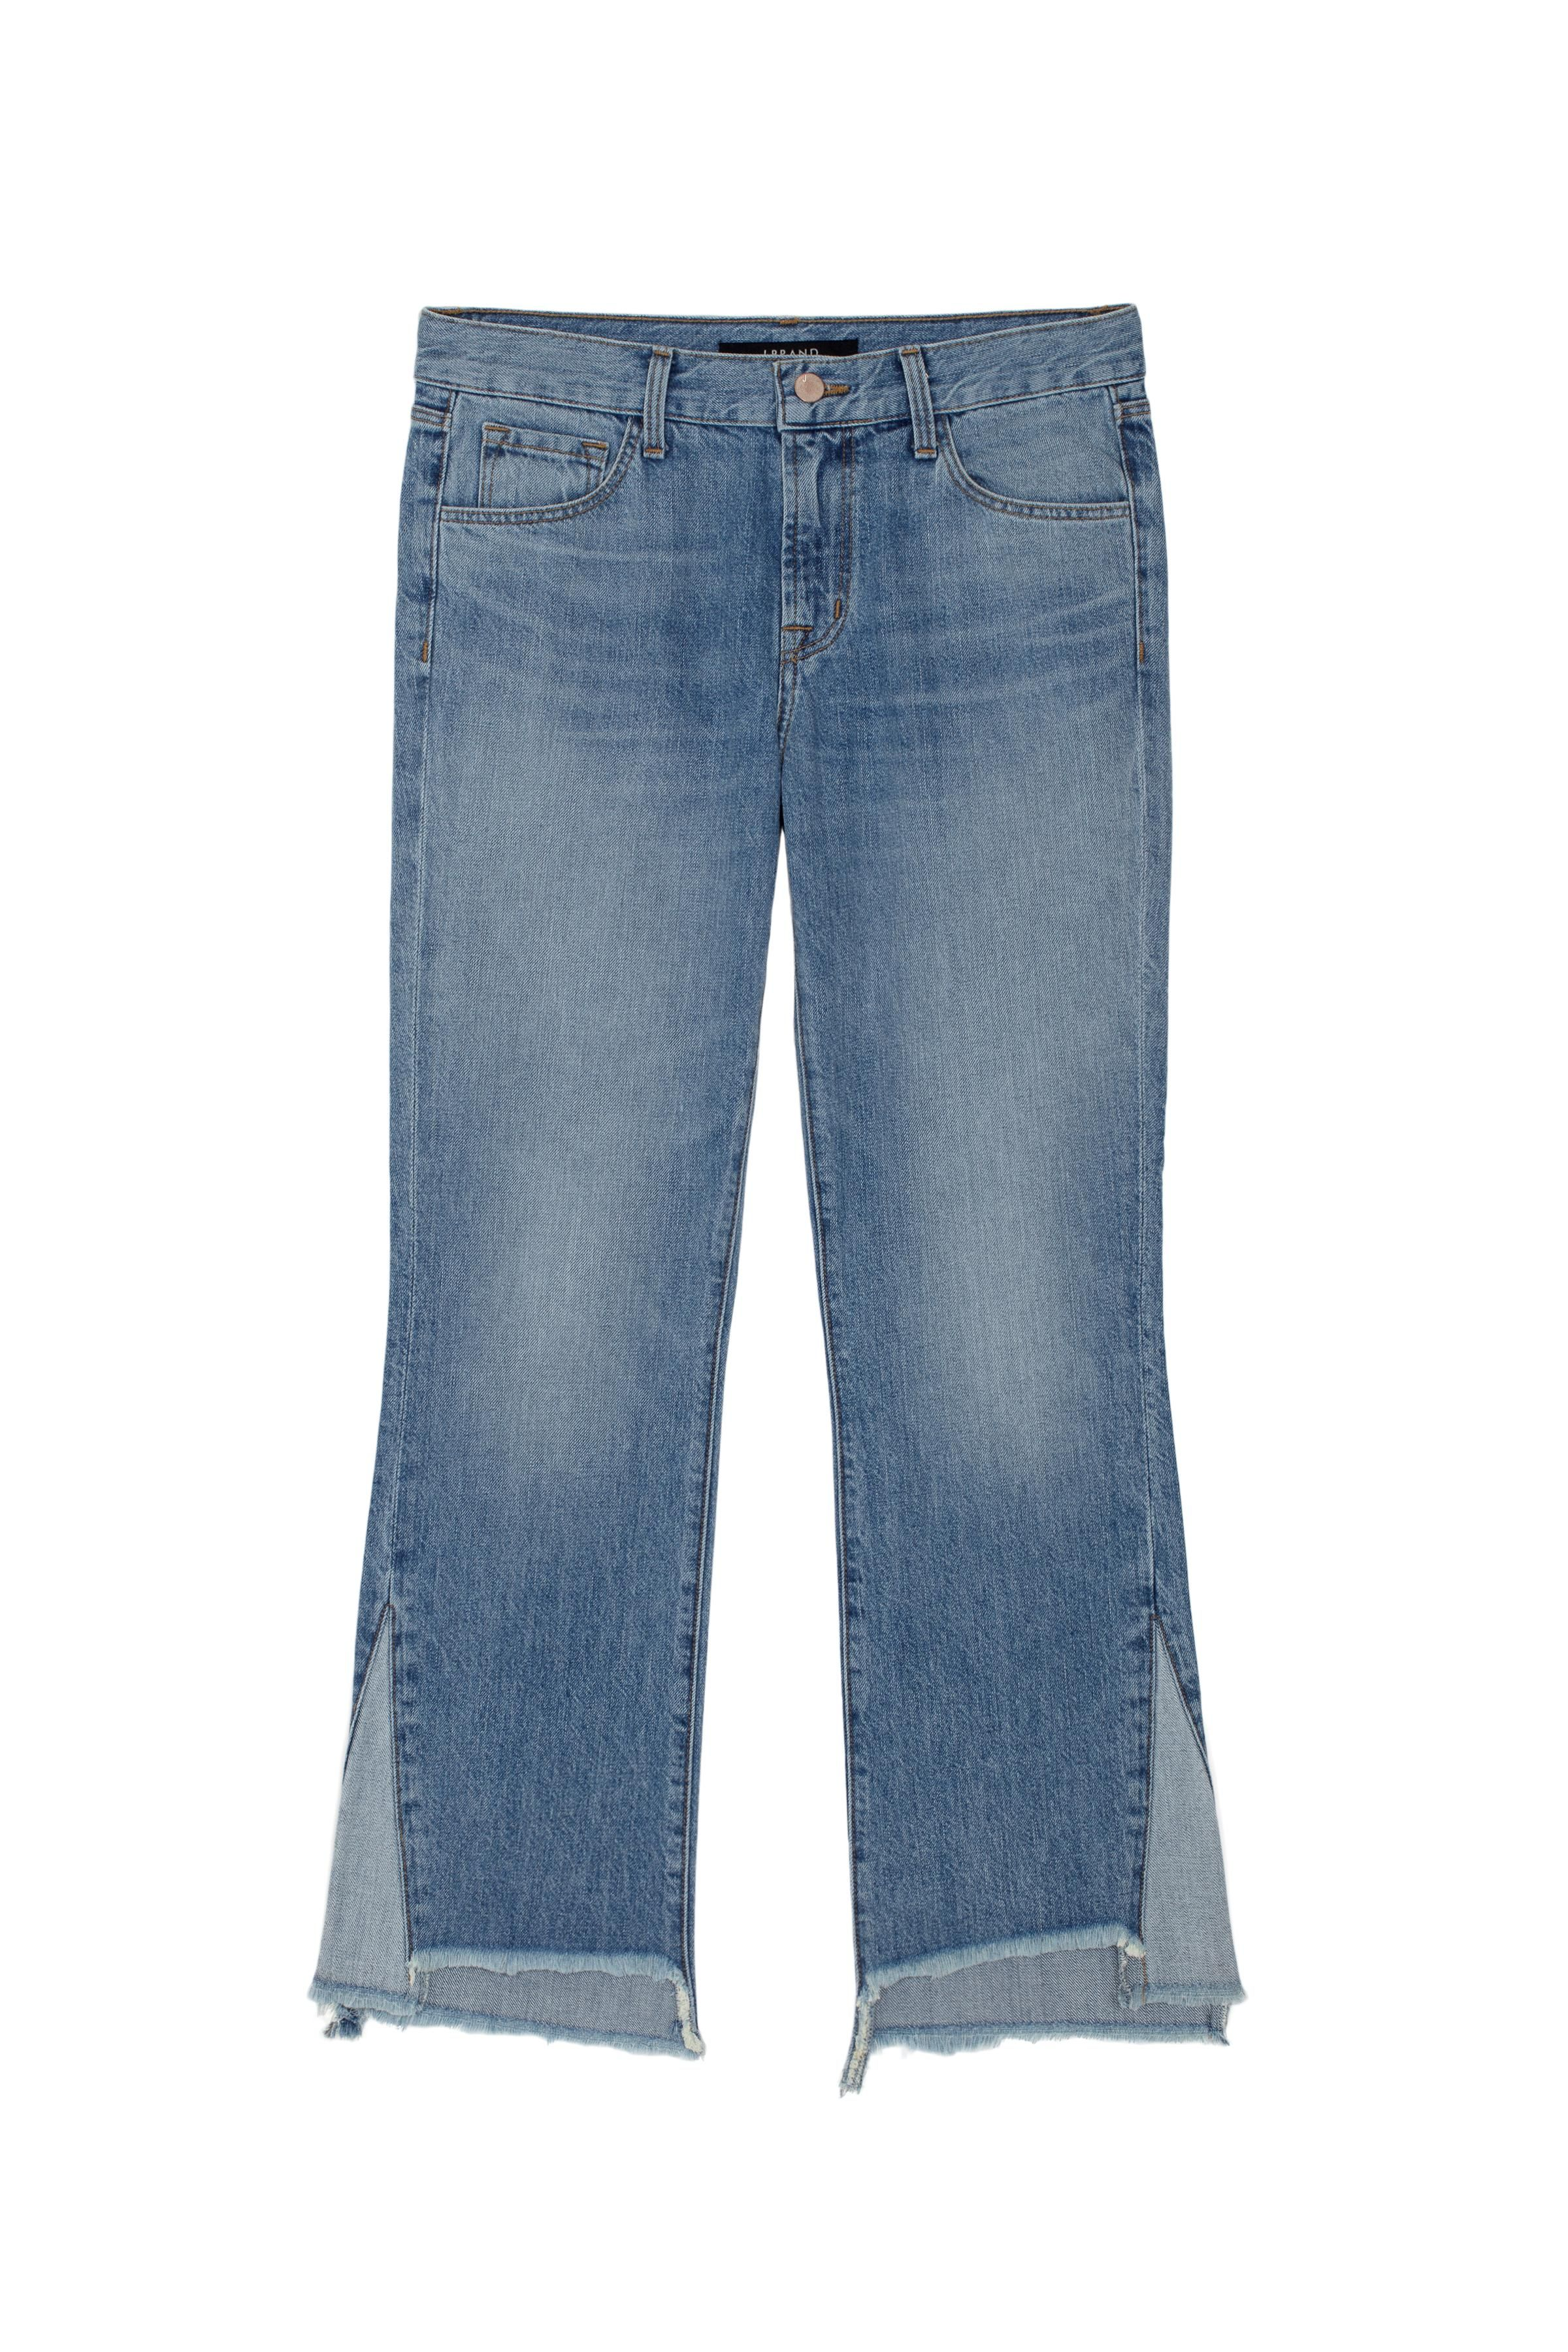 jeans-2018-modelli